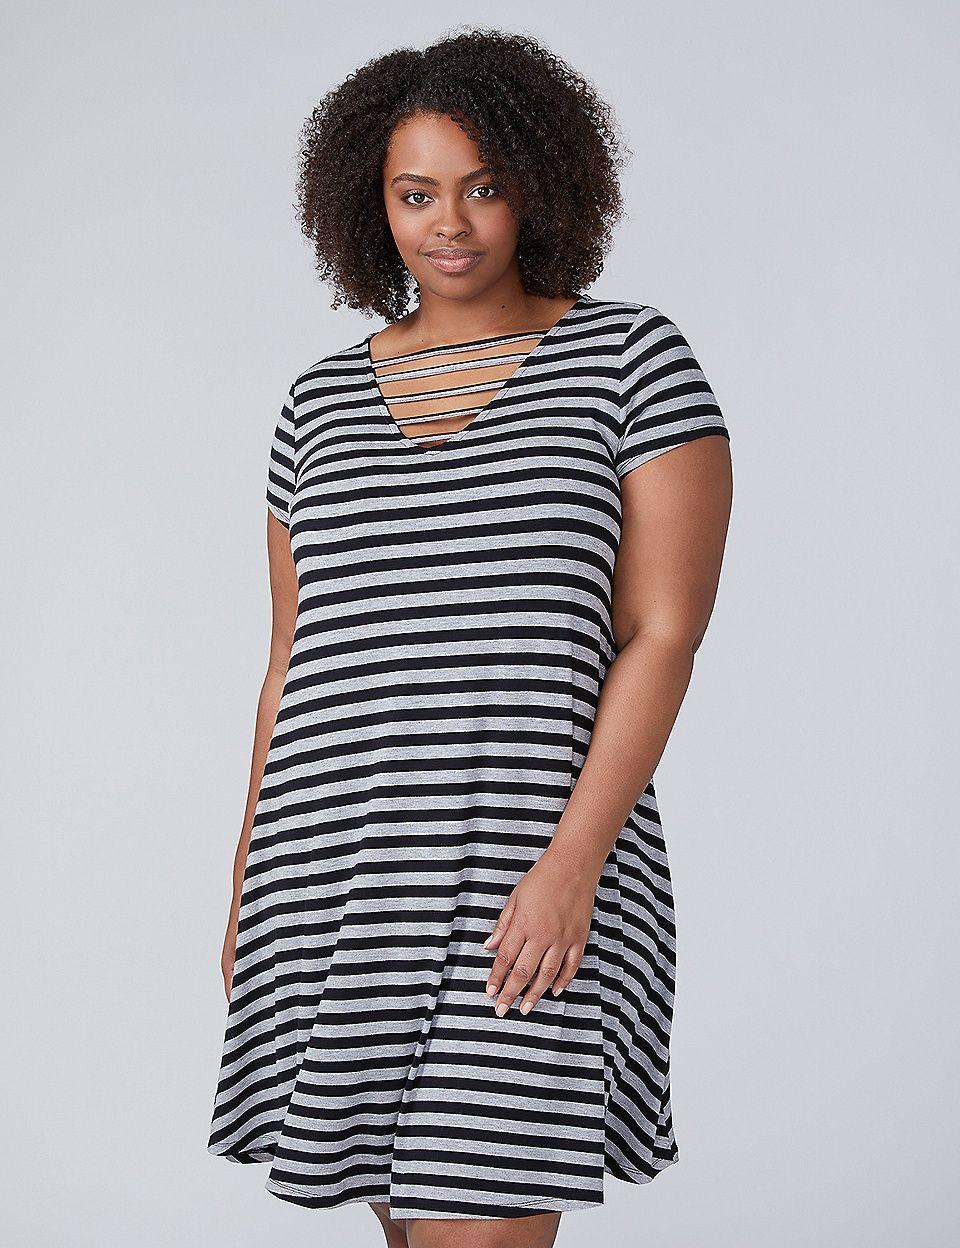 bcd0fed5e4 Horizontal Caged T-Shirt Dress